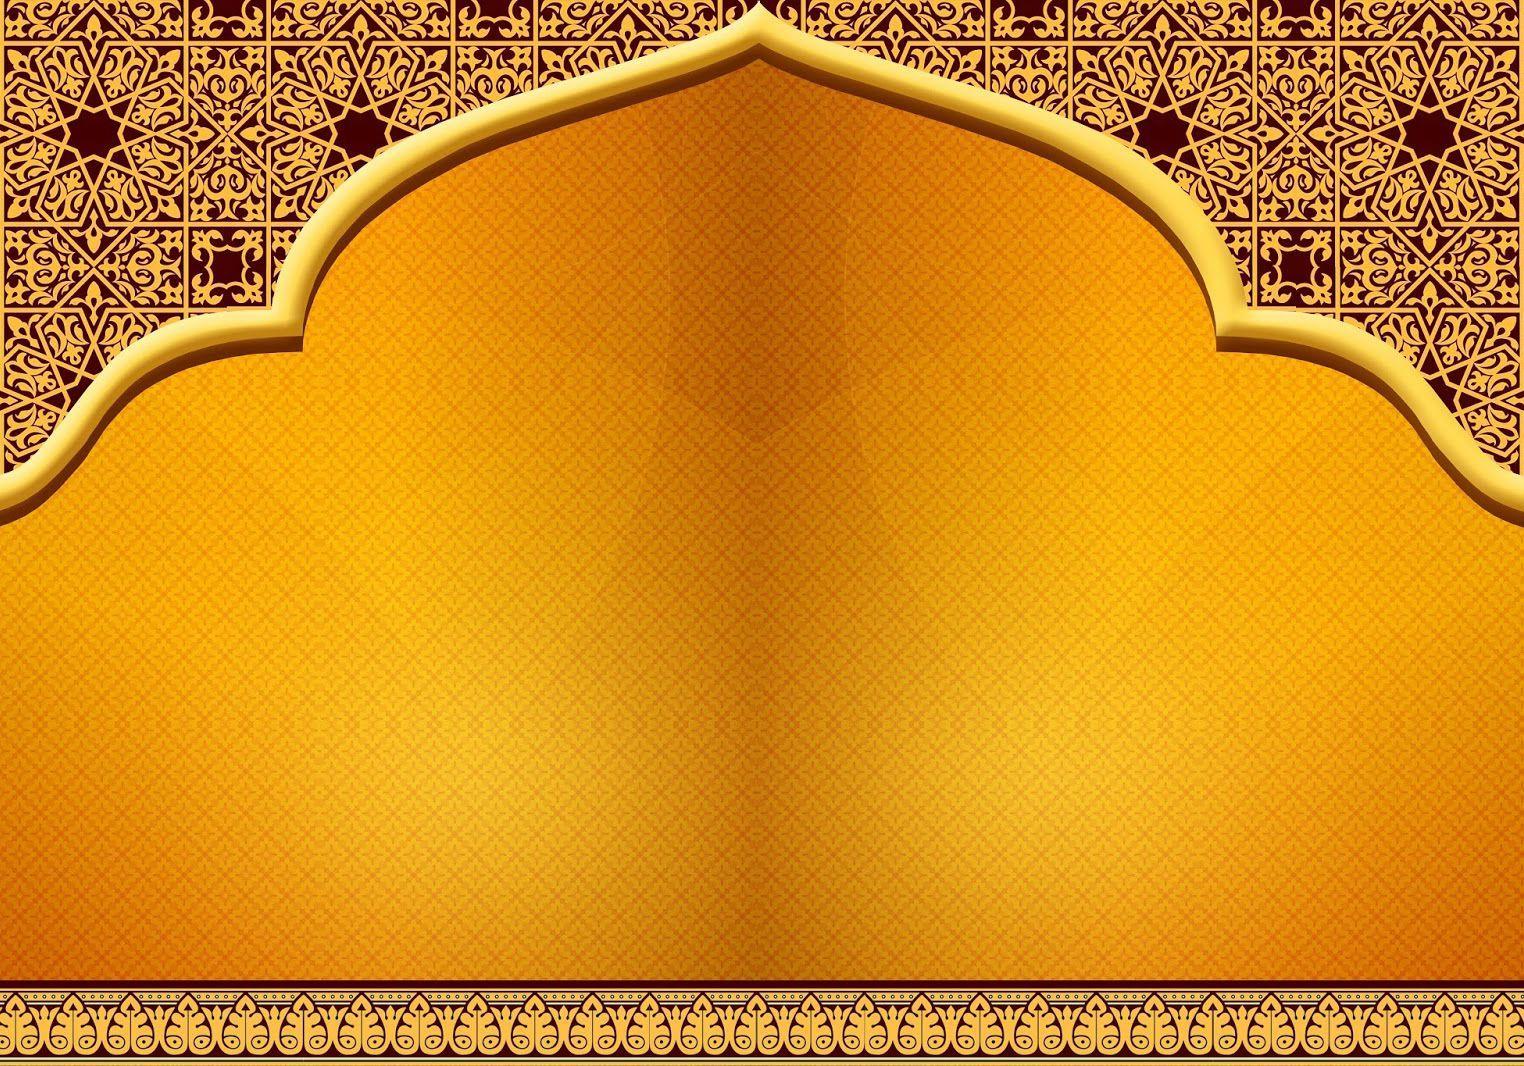 Islamic Design Wallpapers Top Free Islamic Design